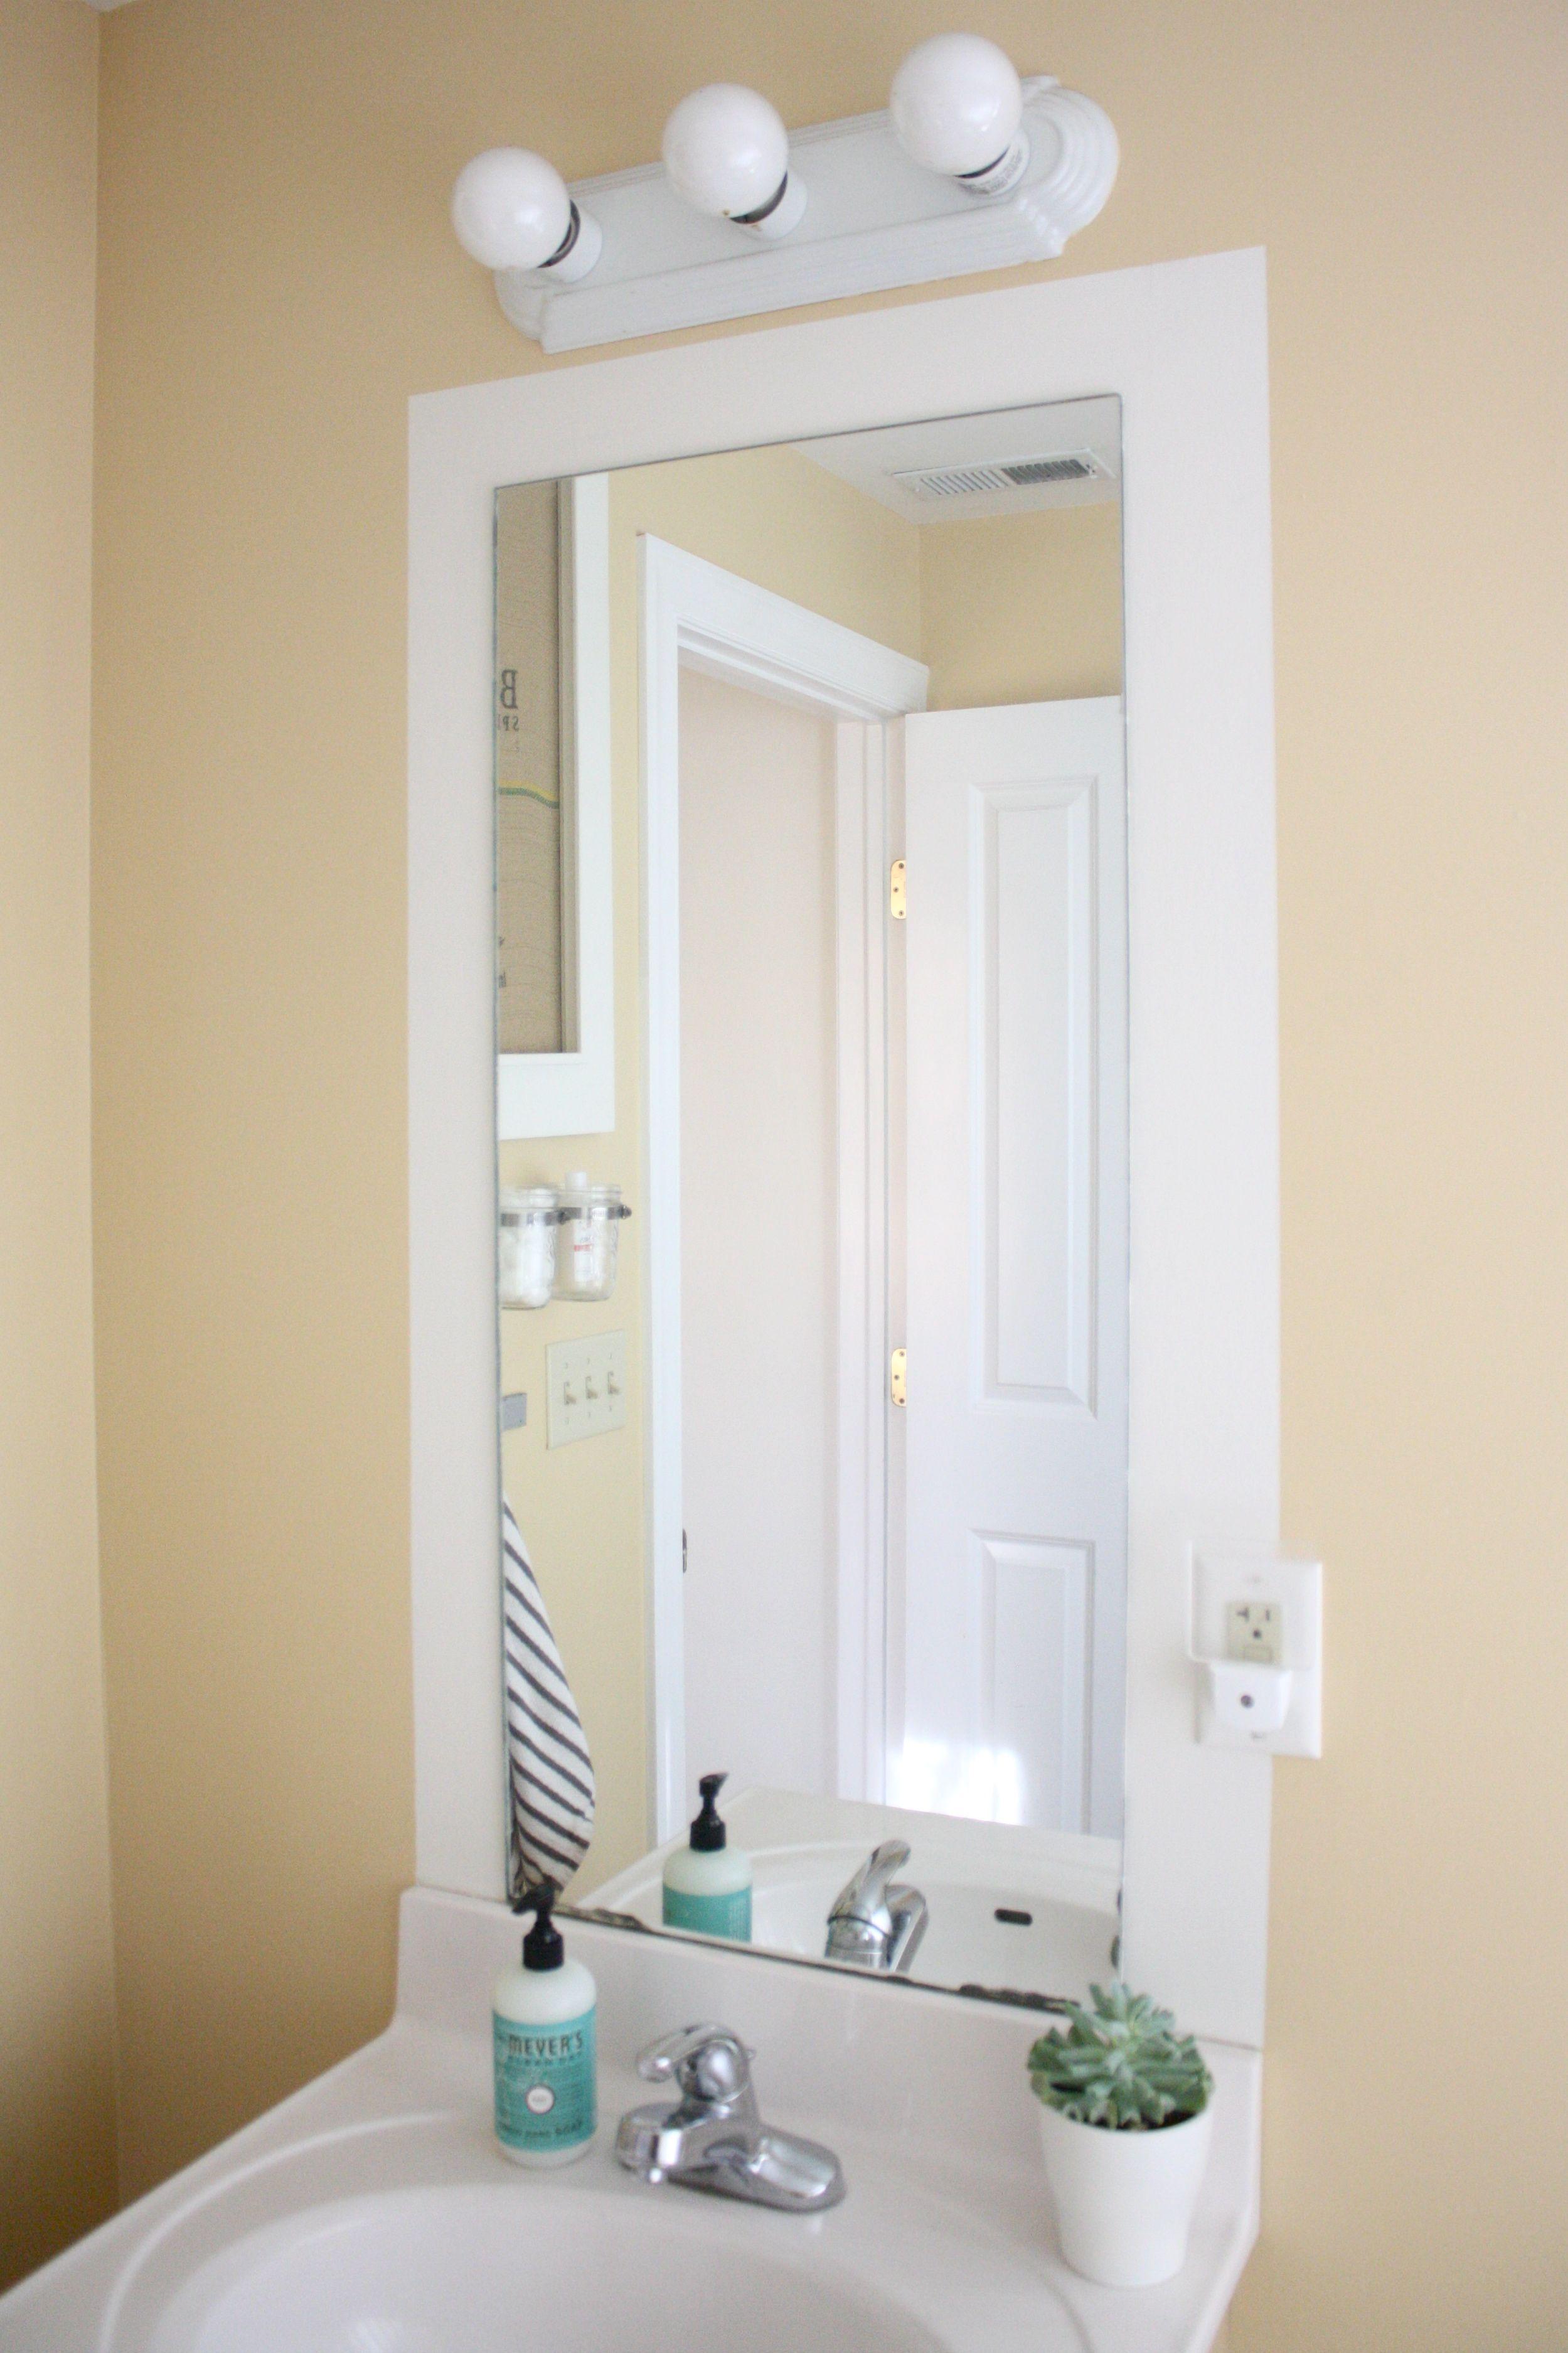 All about bathroom mirror ideas diy frames master nautical